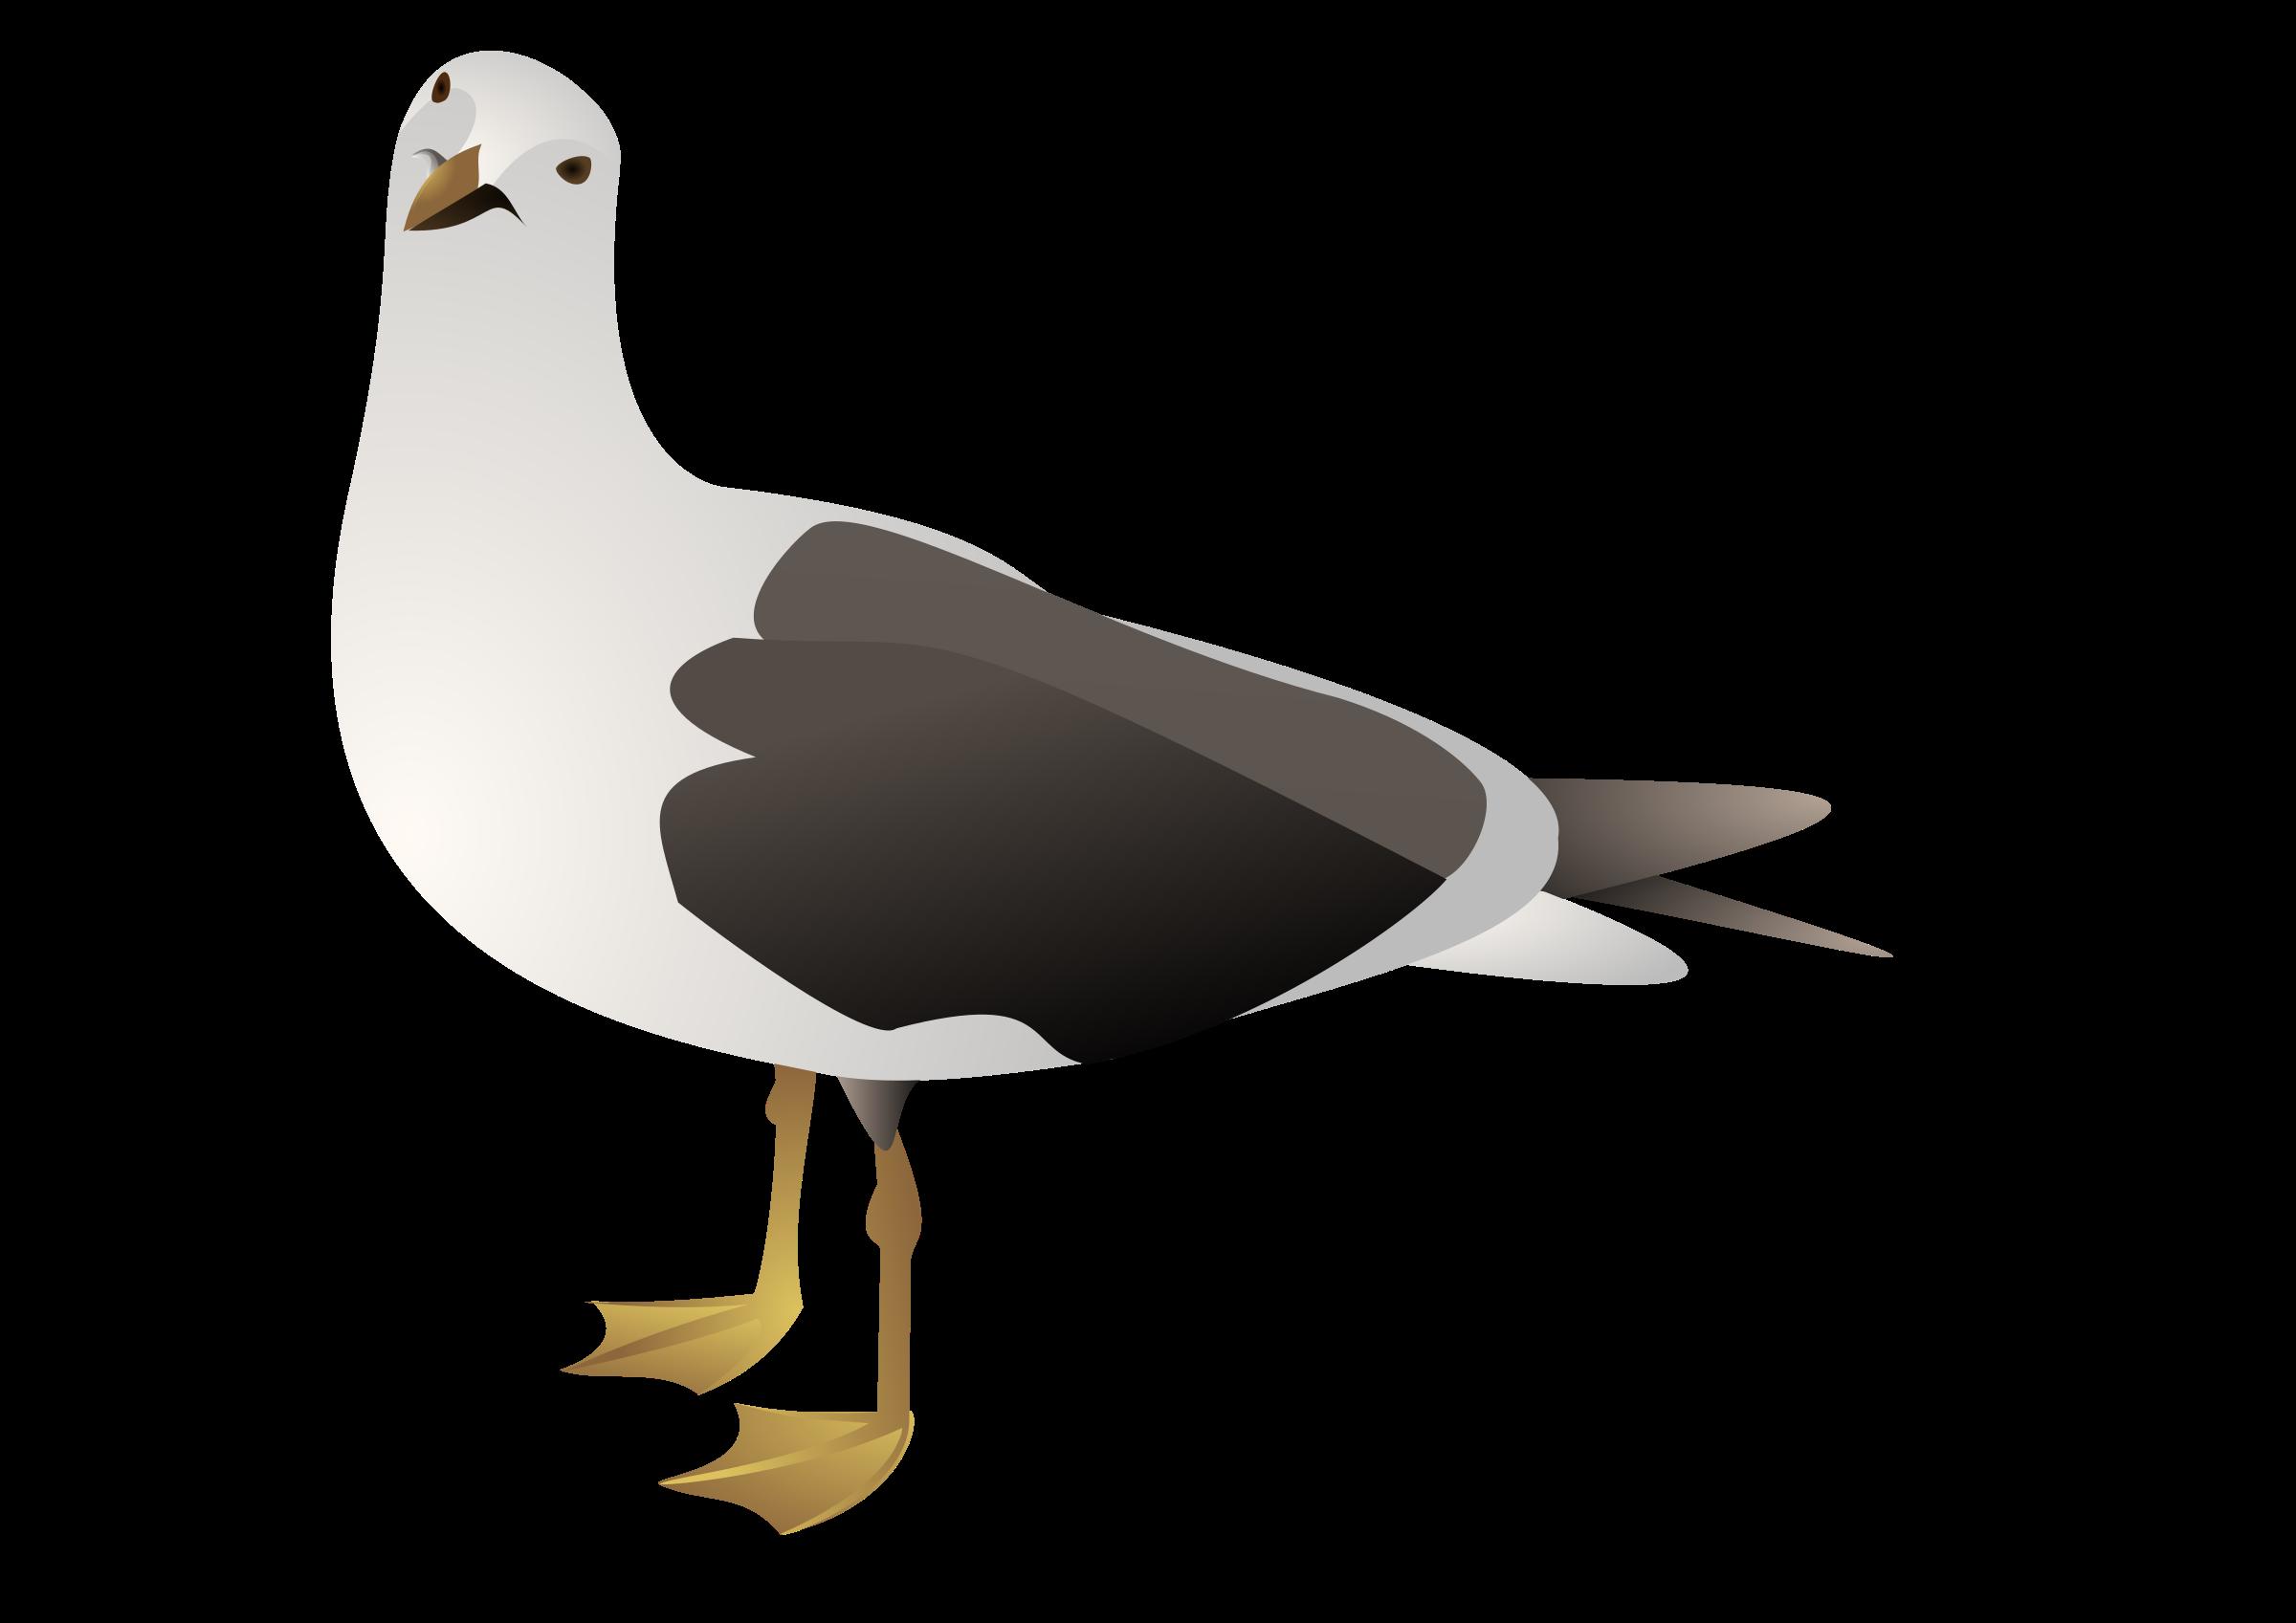 Seagull clipart transparent #7